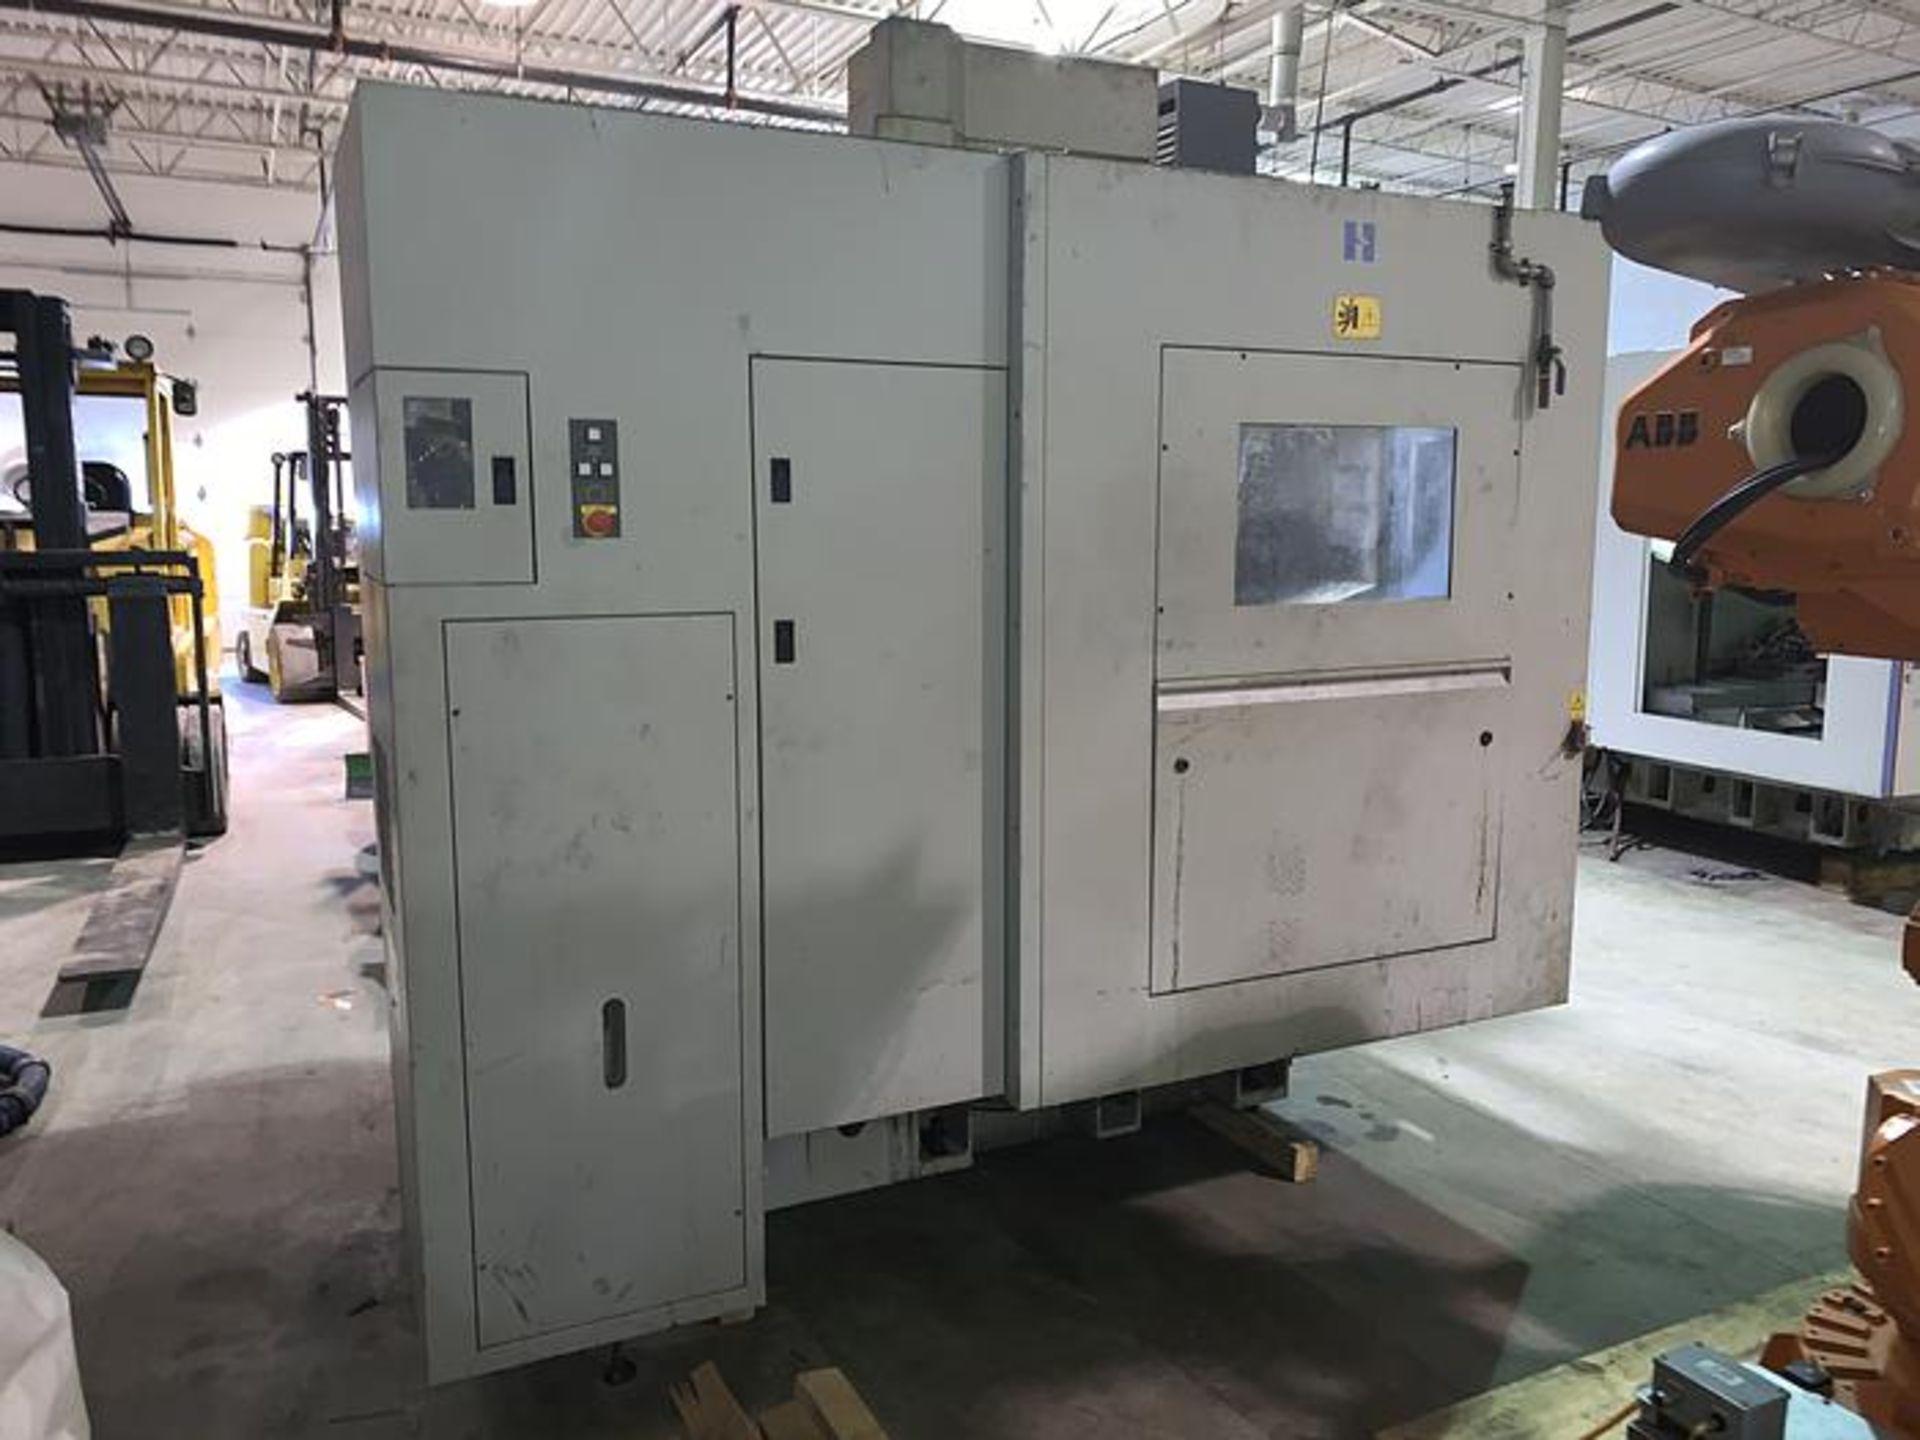 "HARDINGE XR760 CNC VMC PRODUCTION CENTER 30""X24""X24"", YEAR 2010, SN XRAB0A0001 - Image 5 of 12"